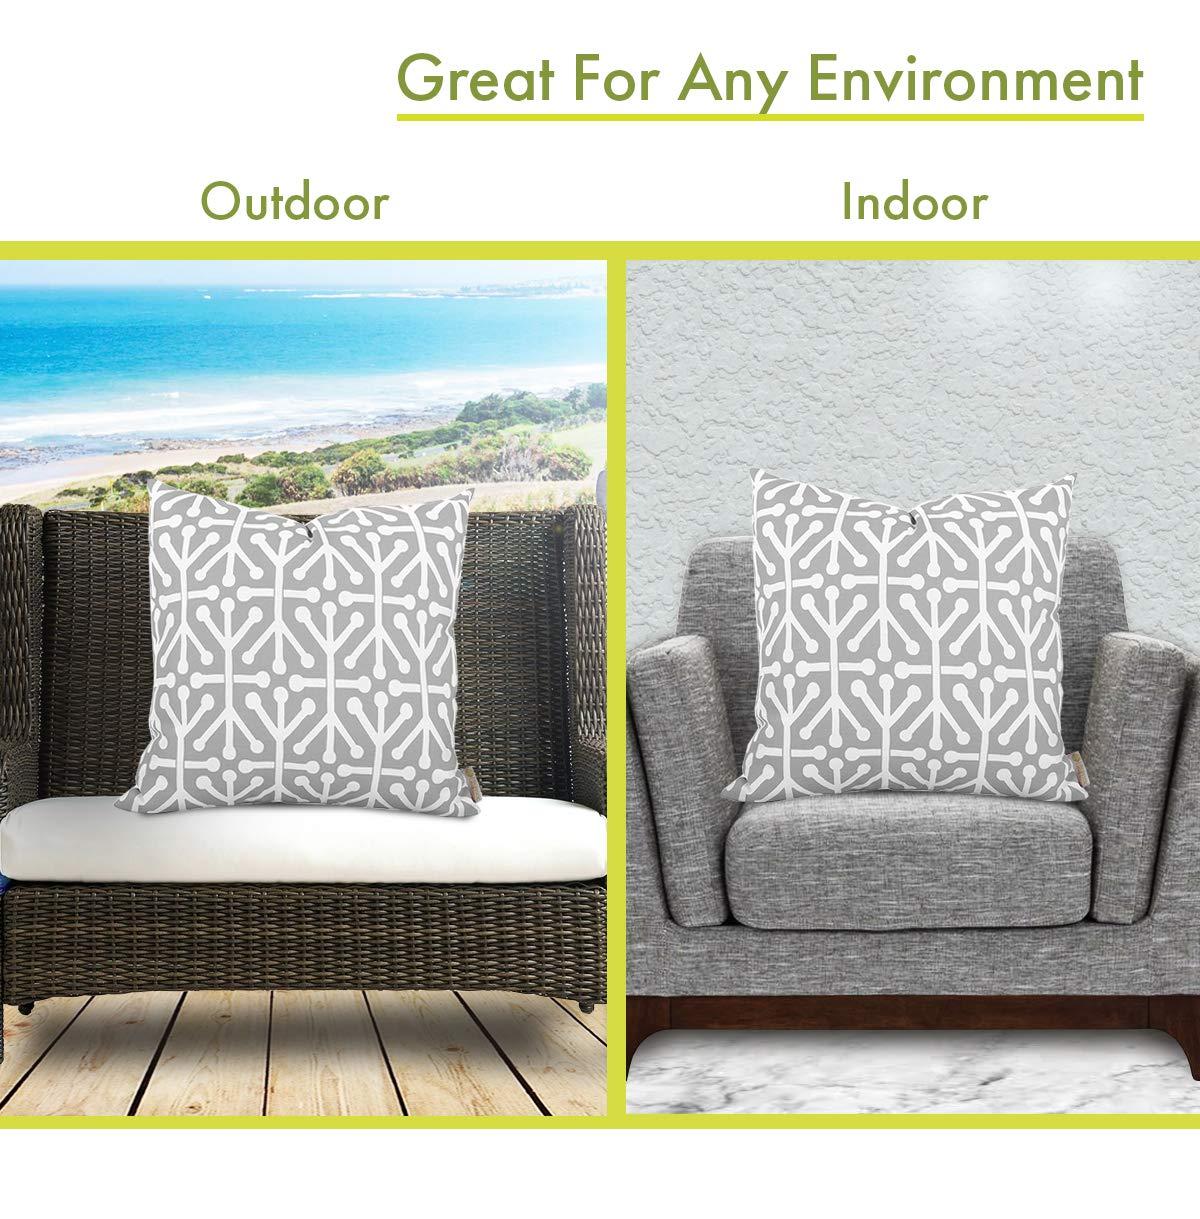 Majestic Home Goods Aruba Pillow Majestic Home Goods LG 85907220984